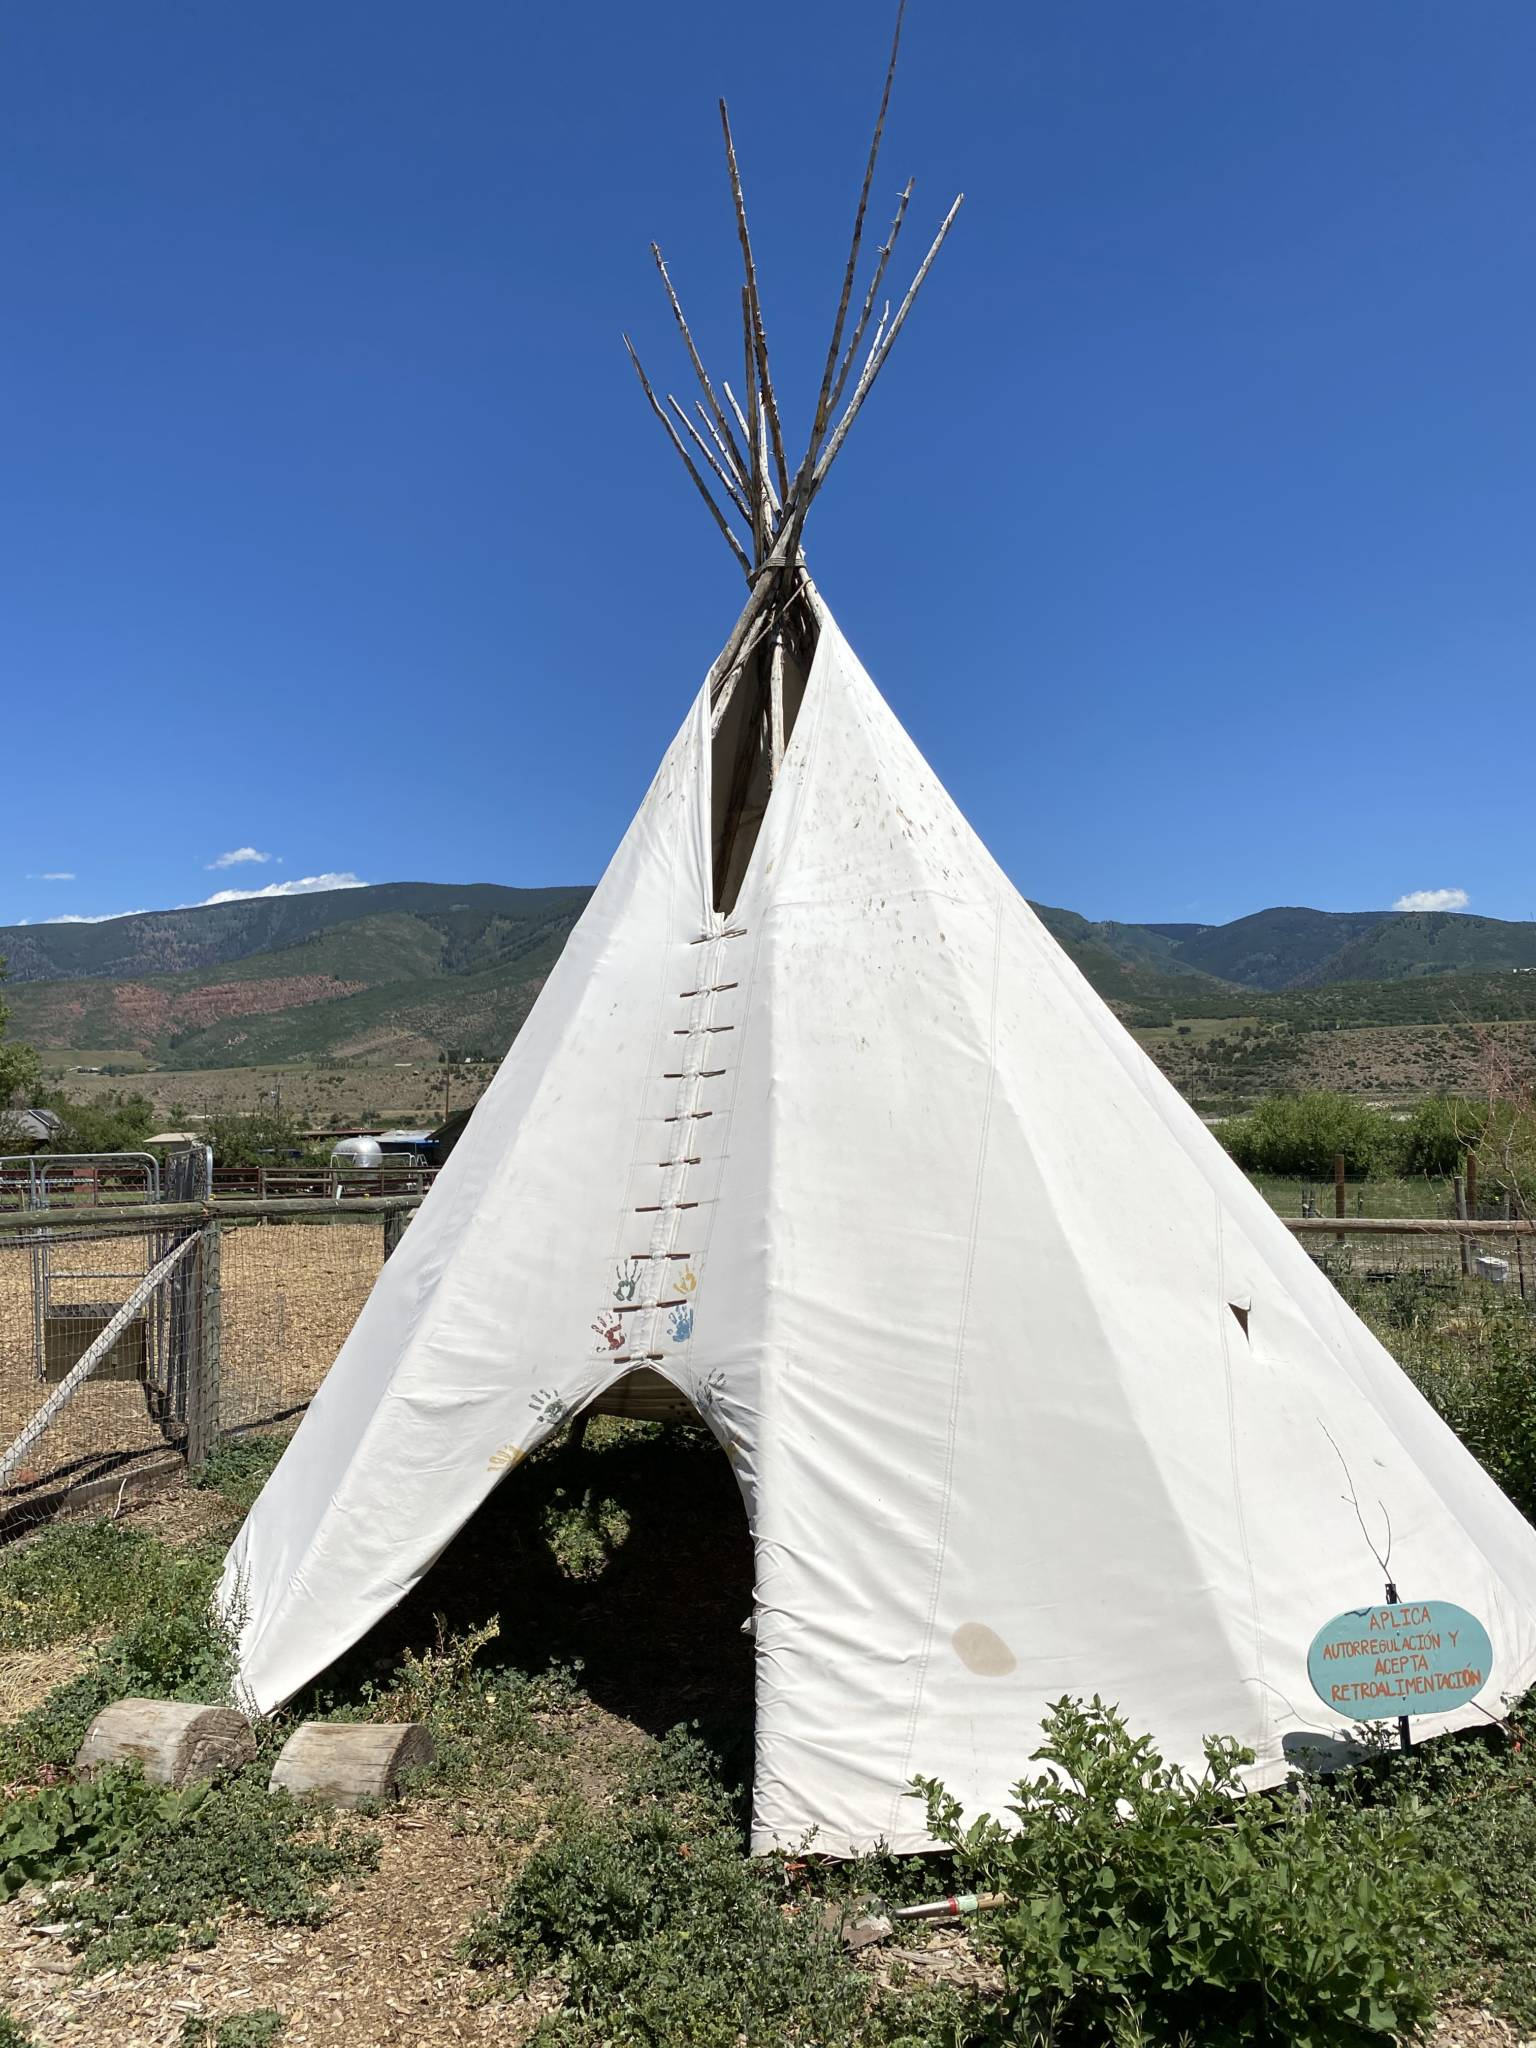 John Denver's handprints on a teepee at The Farm Collaborative in Aspen